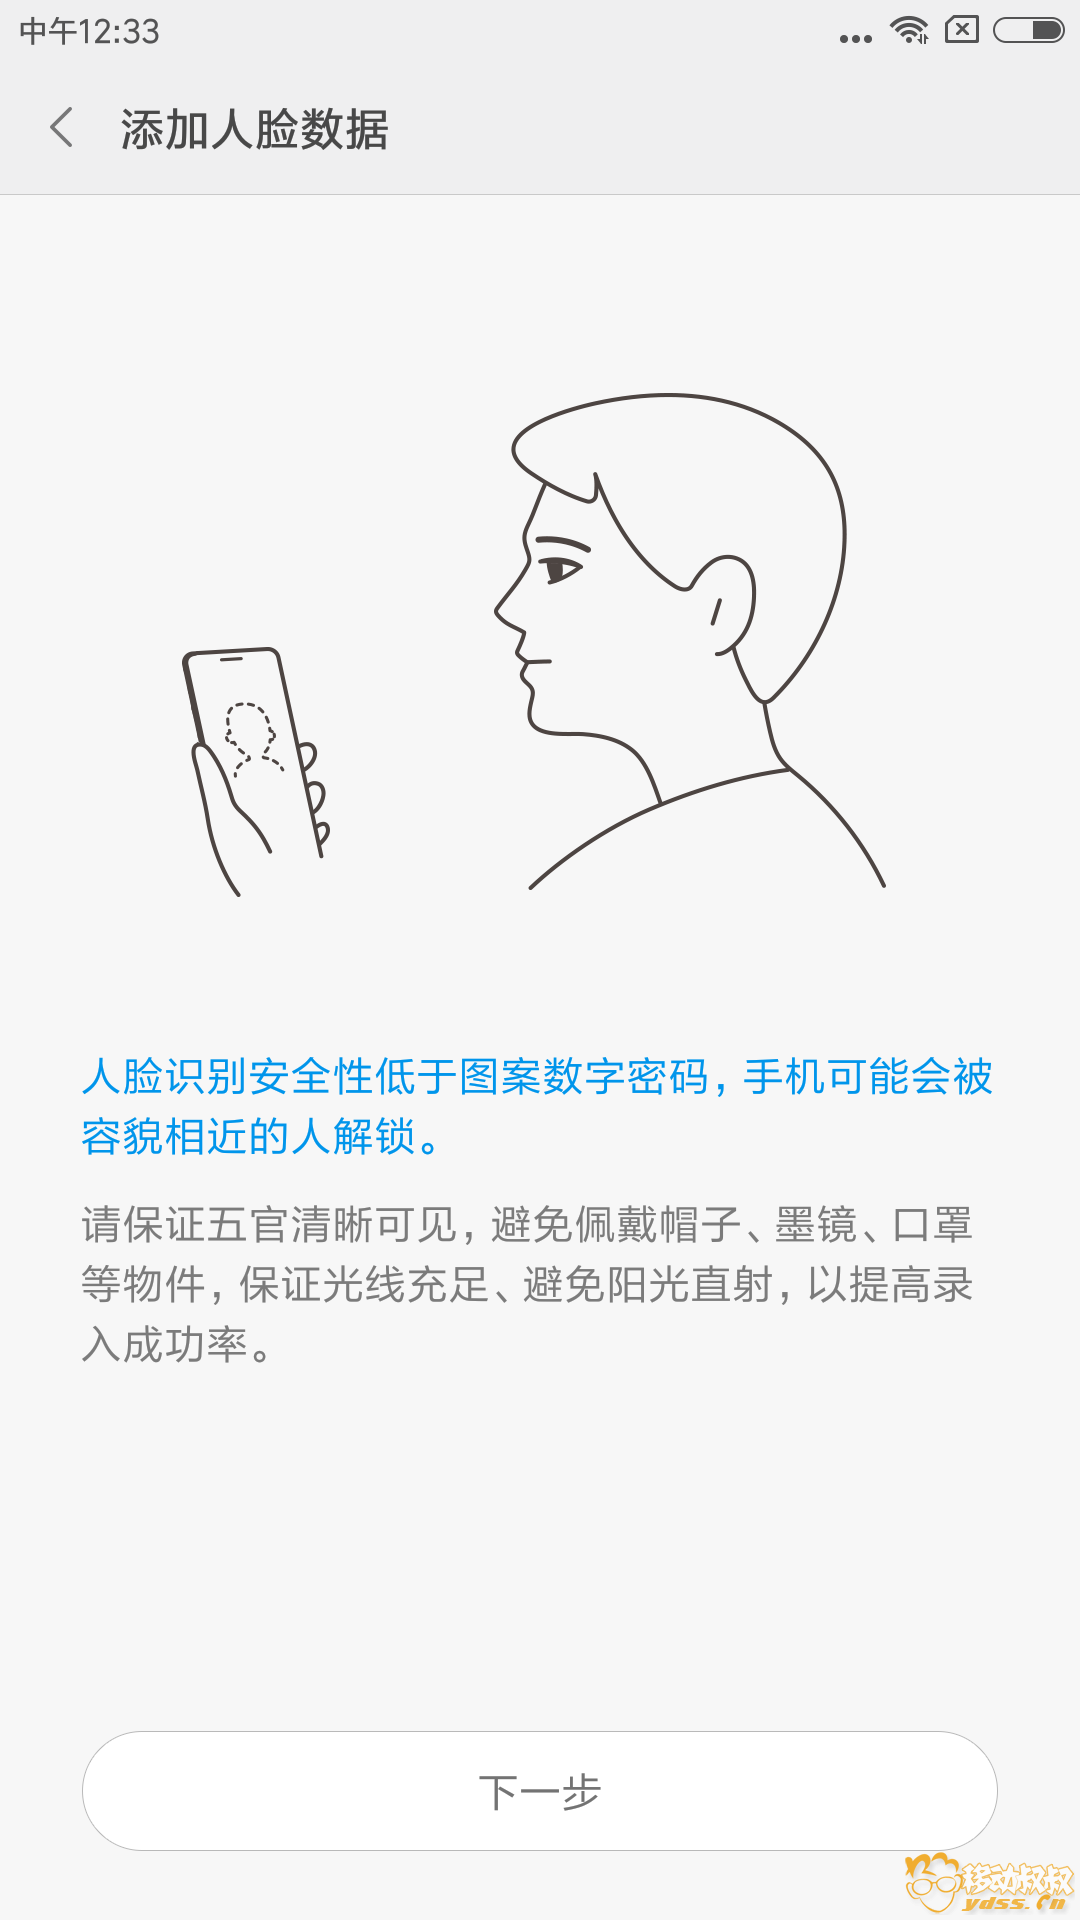 Screenshot_2018-02-04-12-33-57-639_com.android.keyguard.png